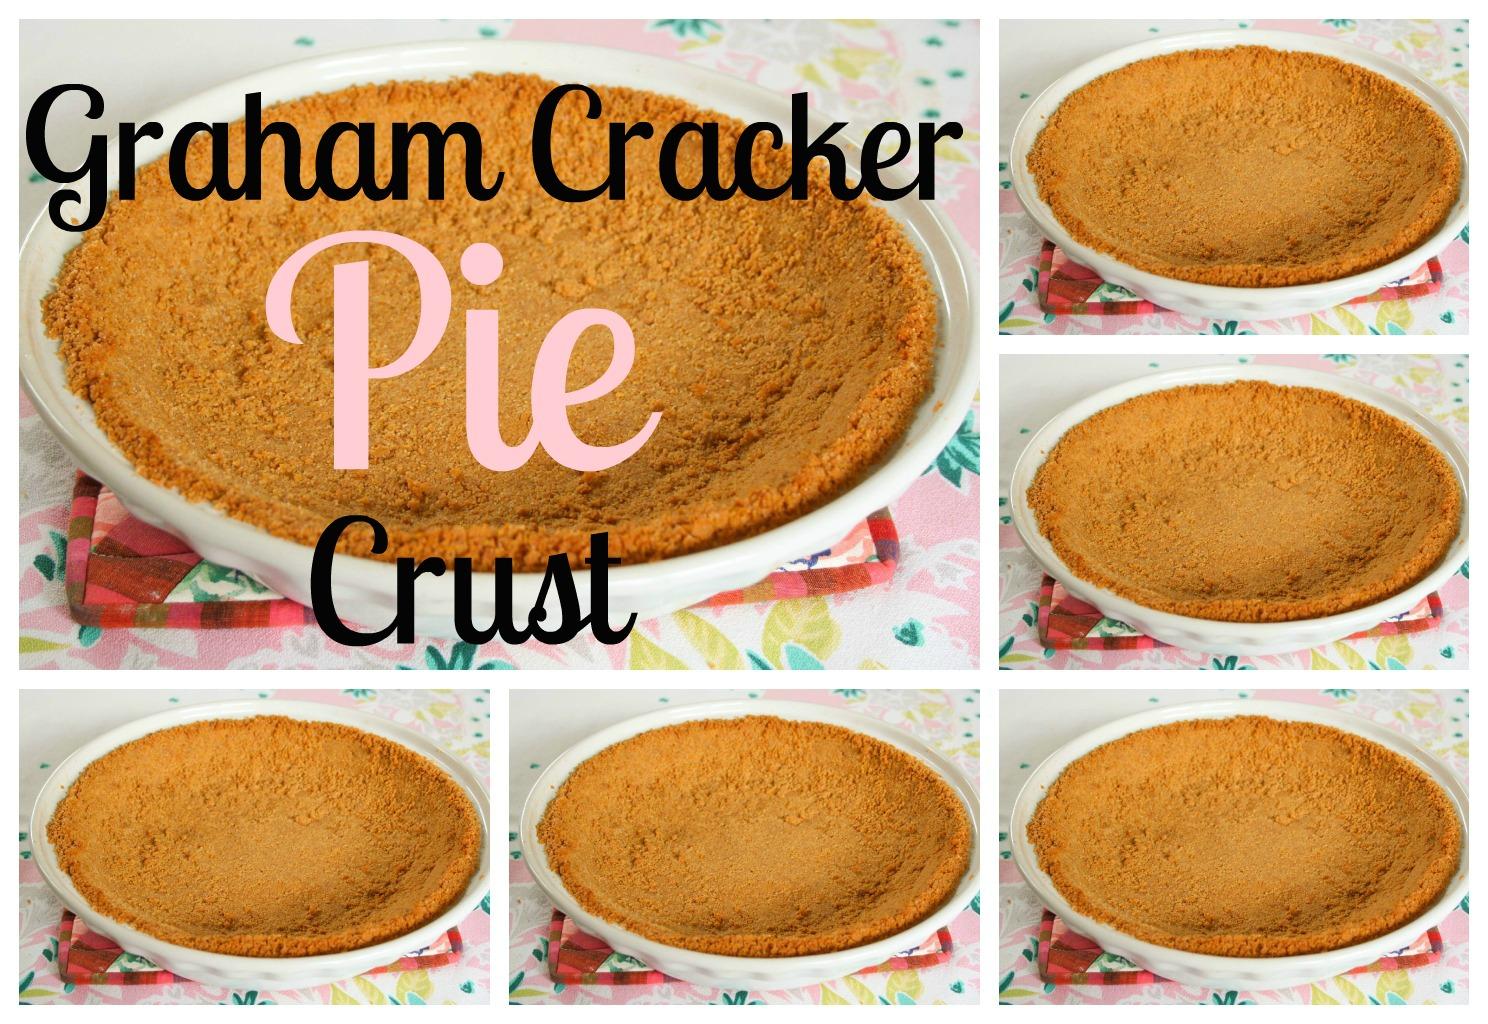 Nabisco Graham Cracker Crust